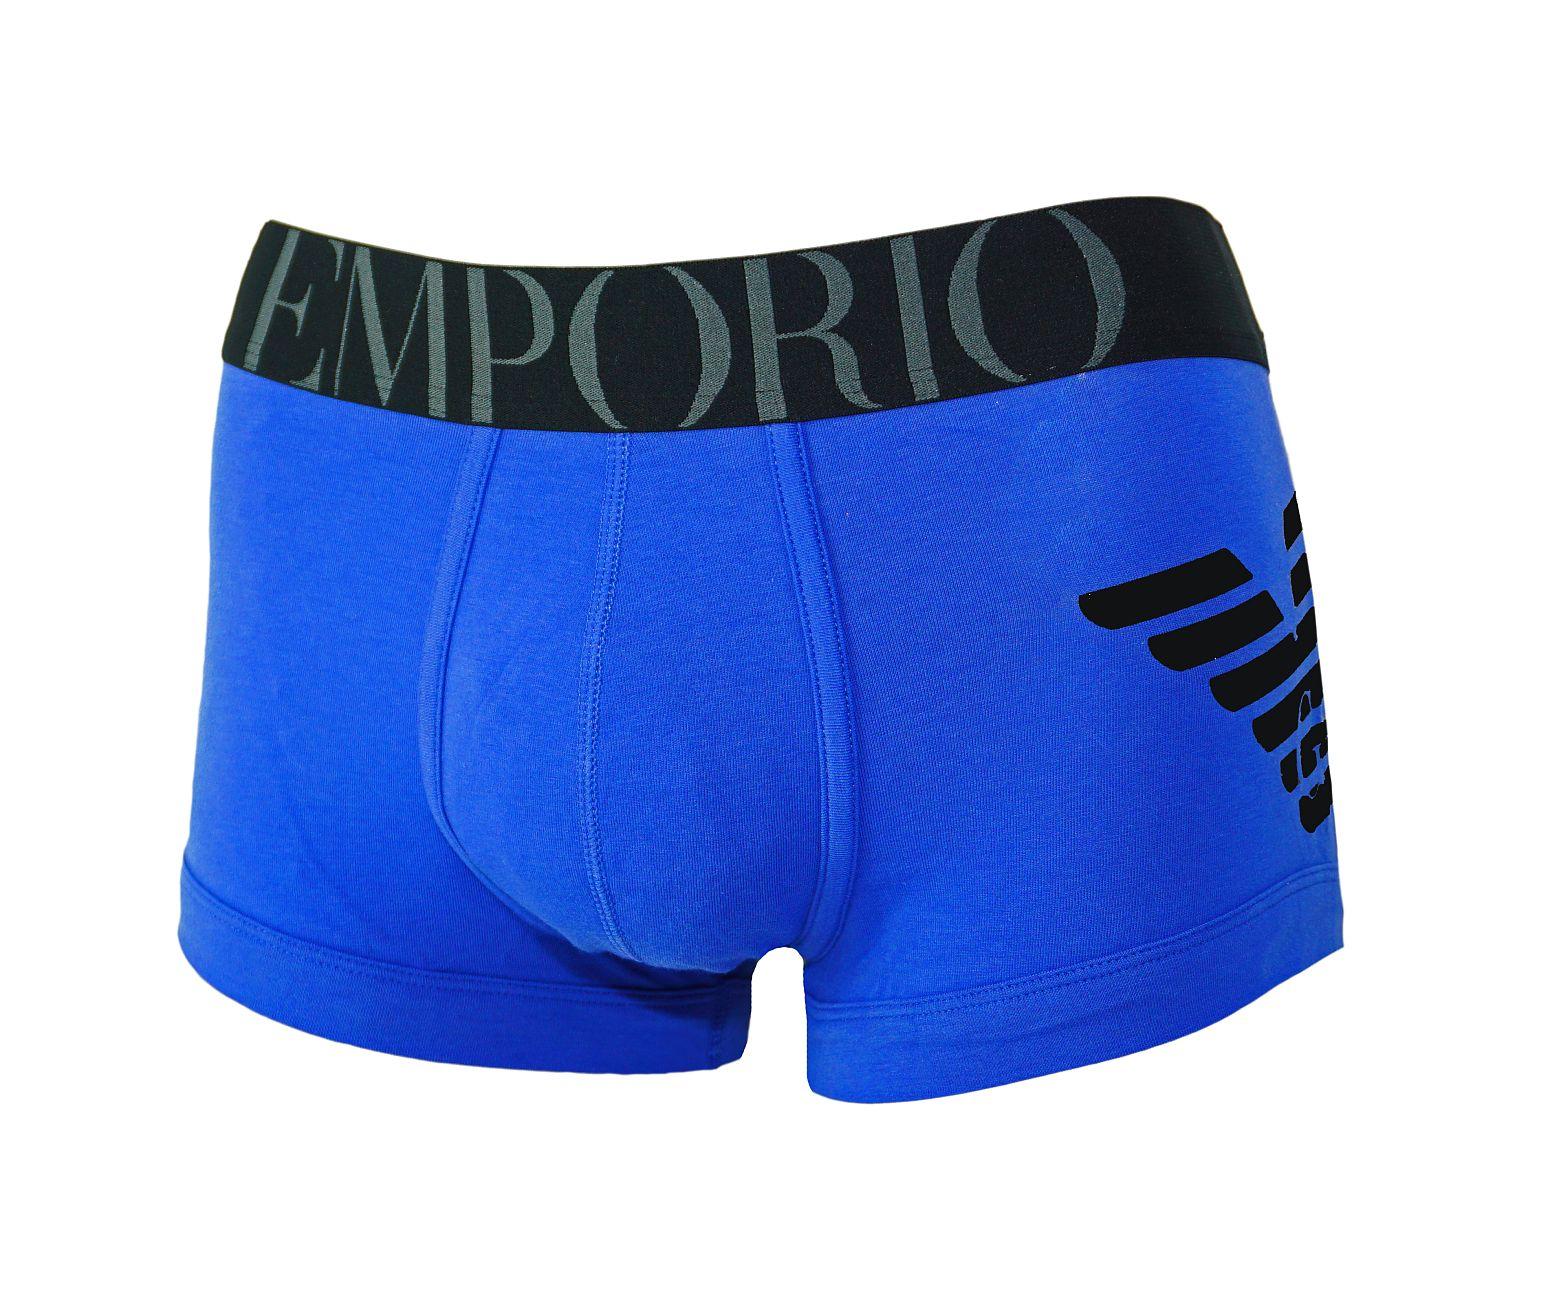 Emporio Armani Trunk Unterhose Short 111866 8P725 20533 ULTRAMARINE F18-EAT2